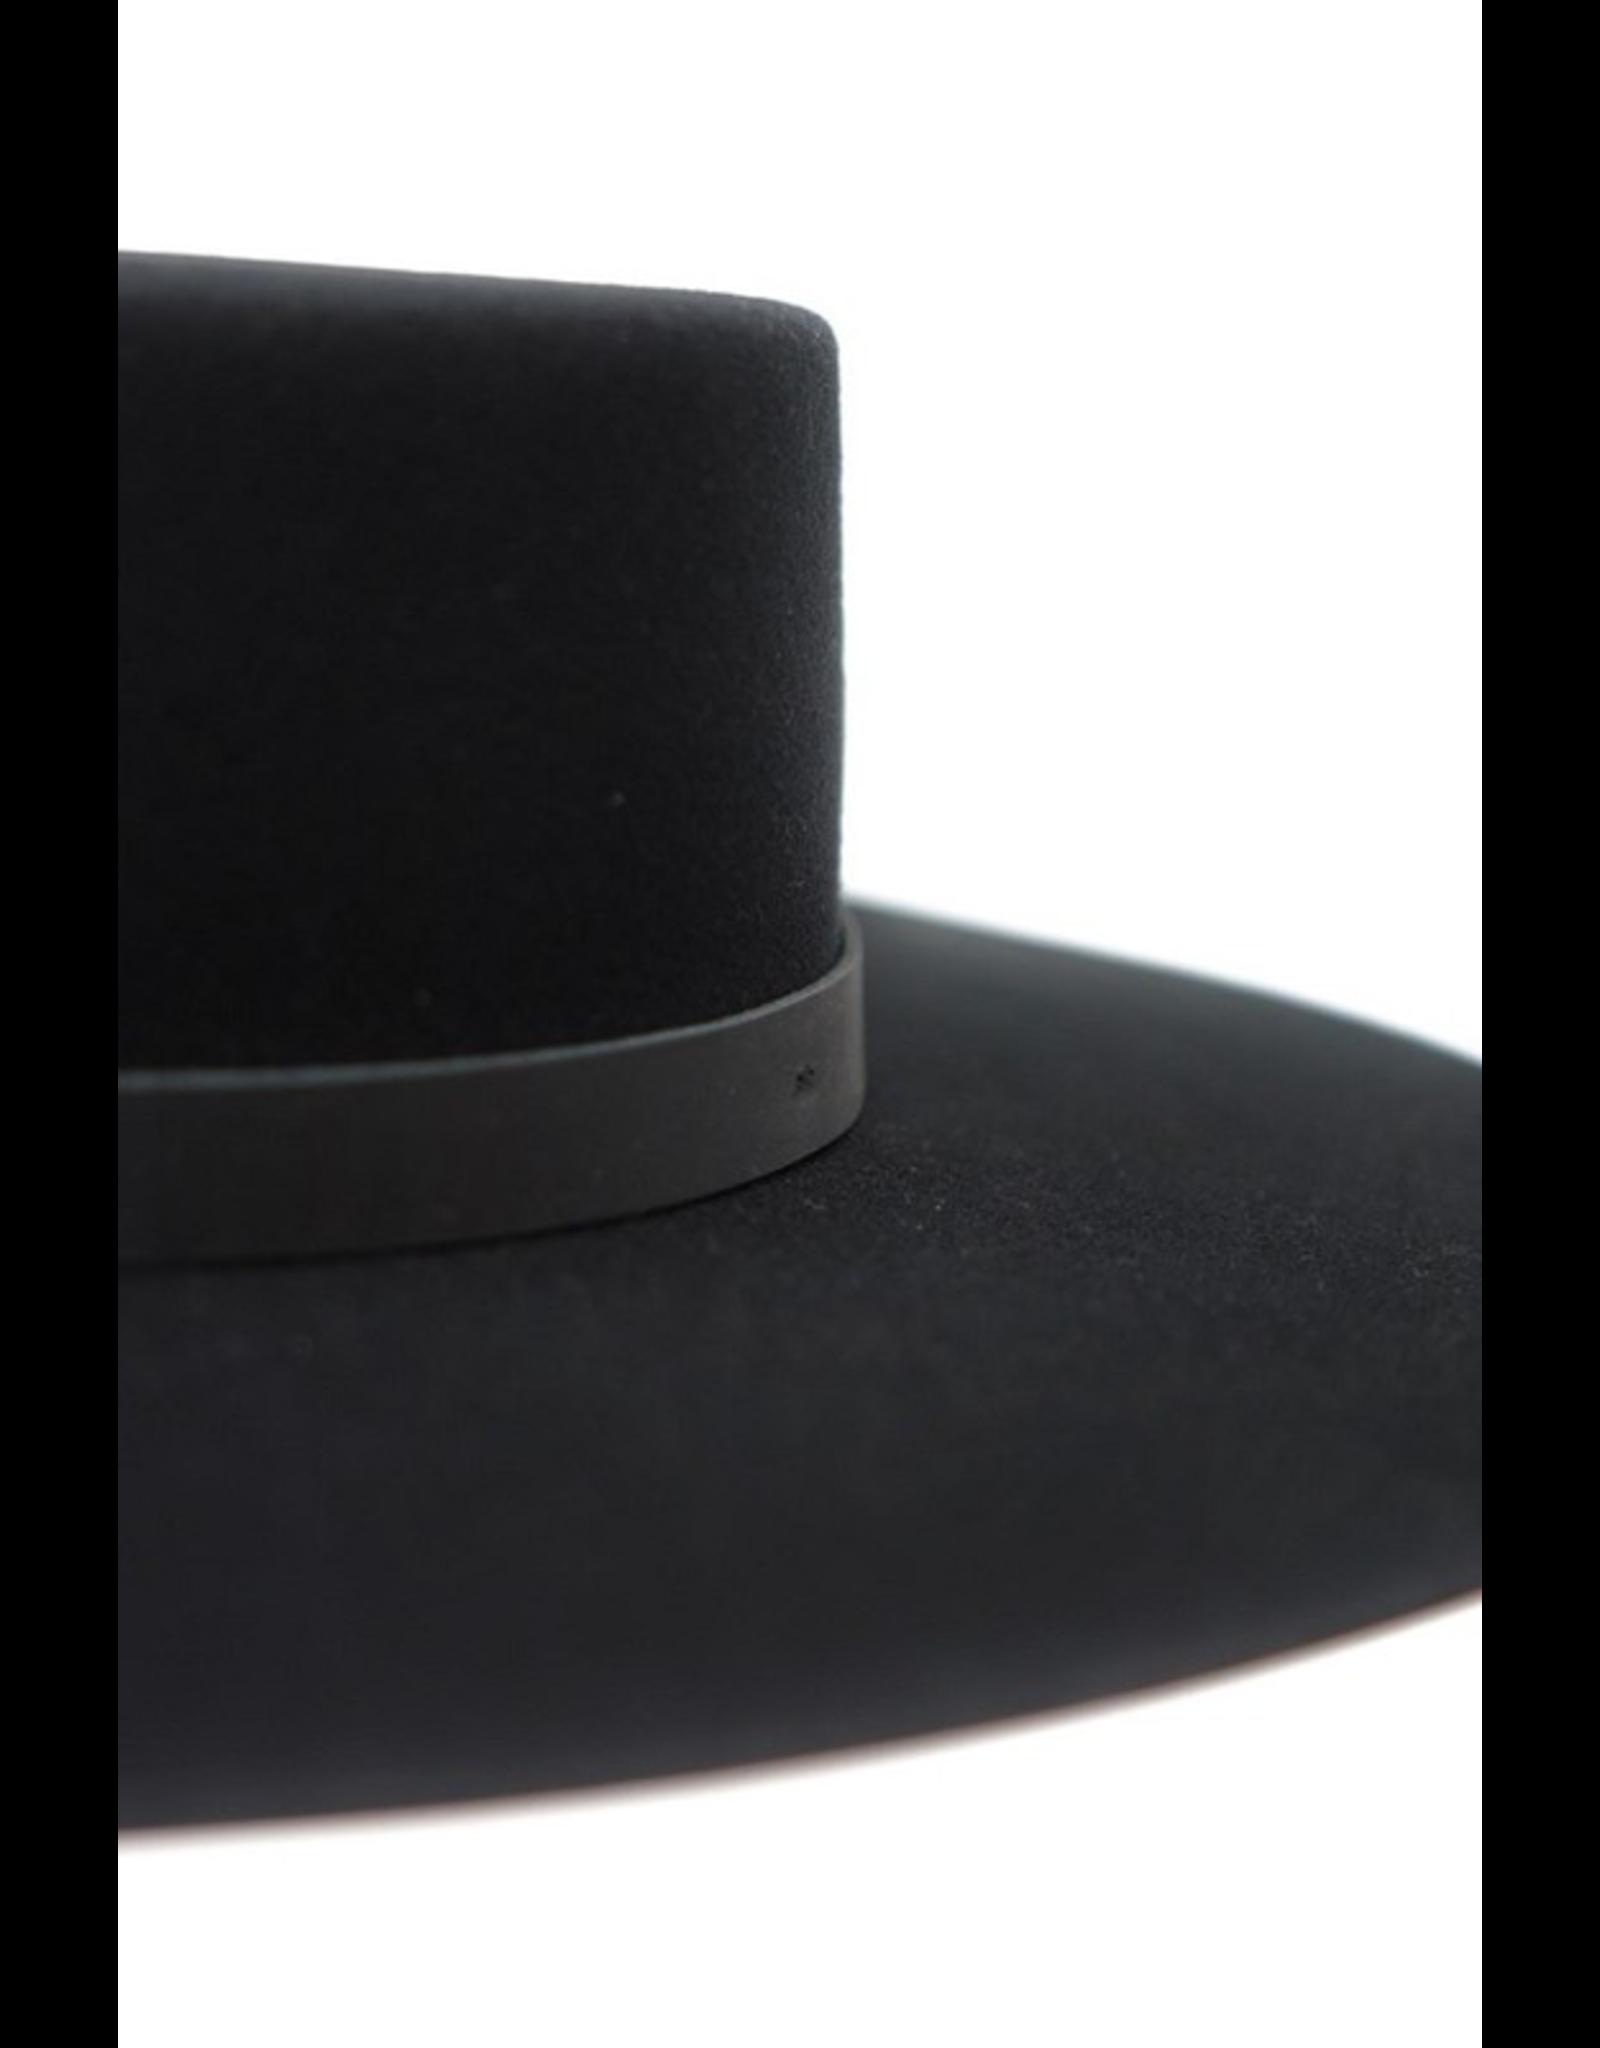 flight lux olive & pique wool stiff felt boater hat black